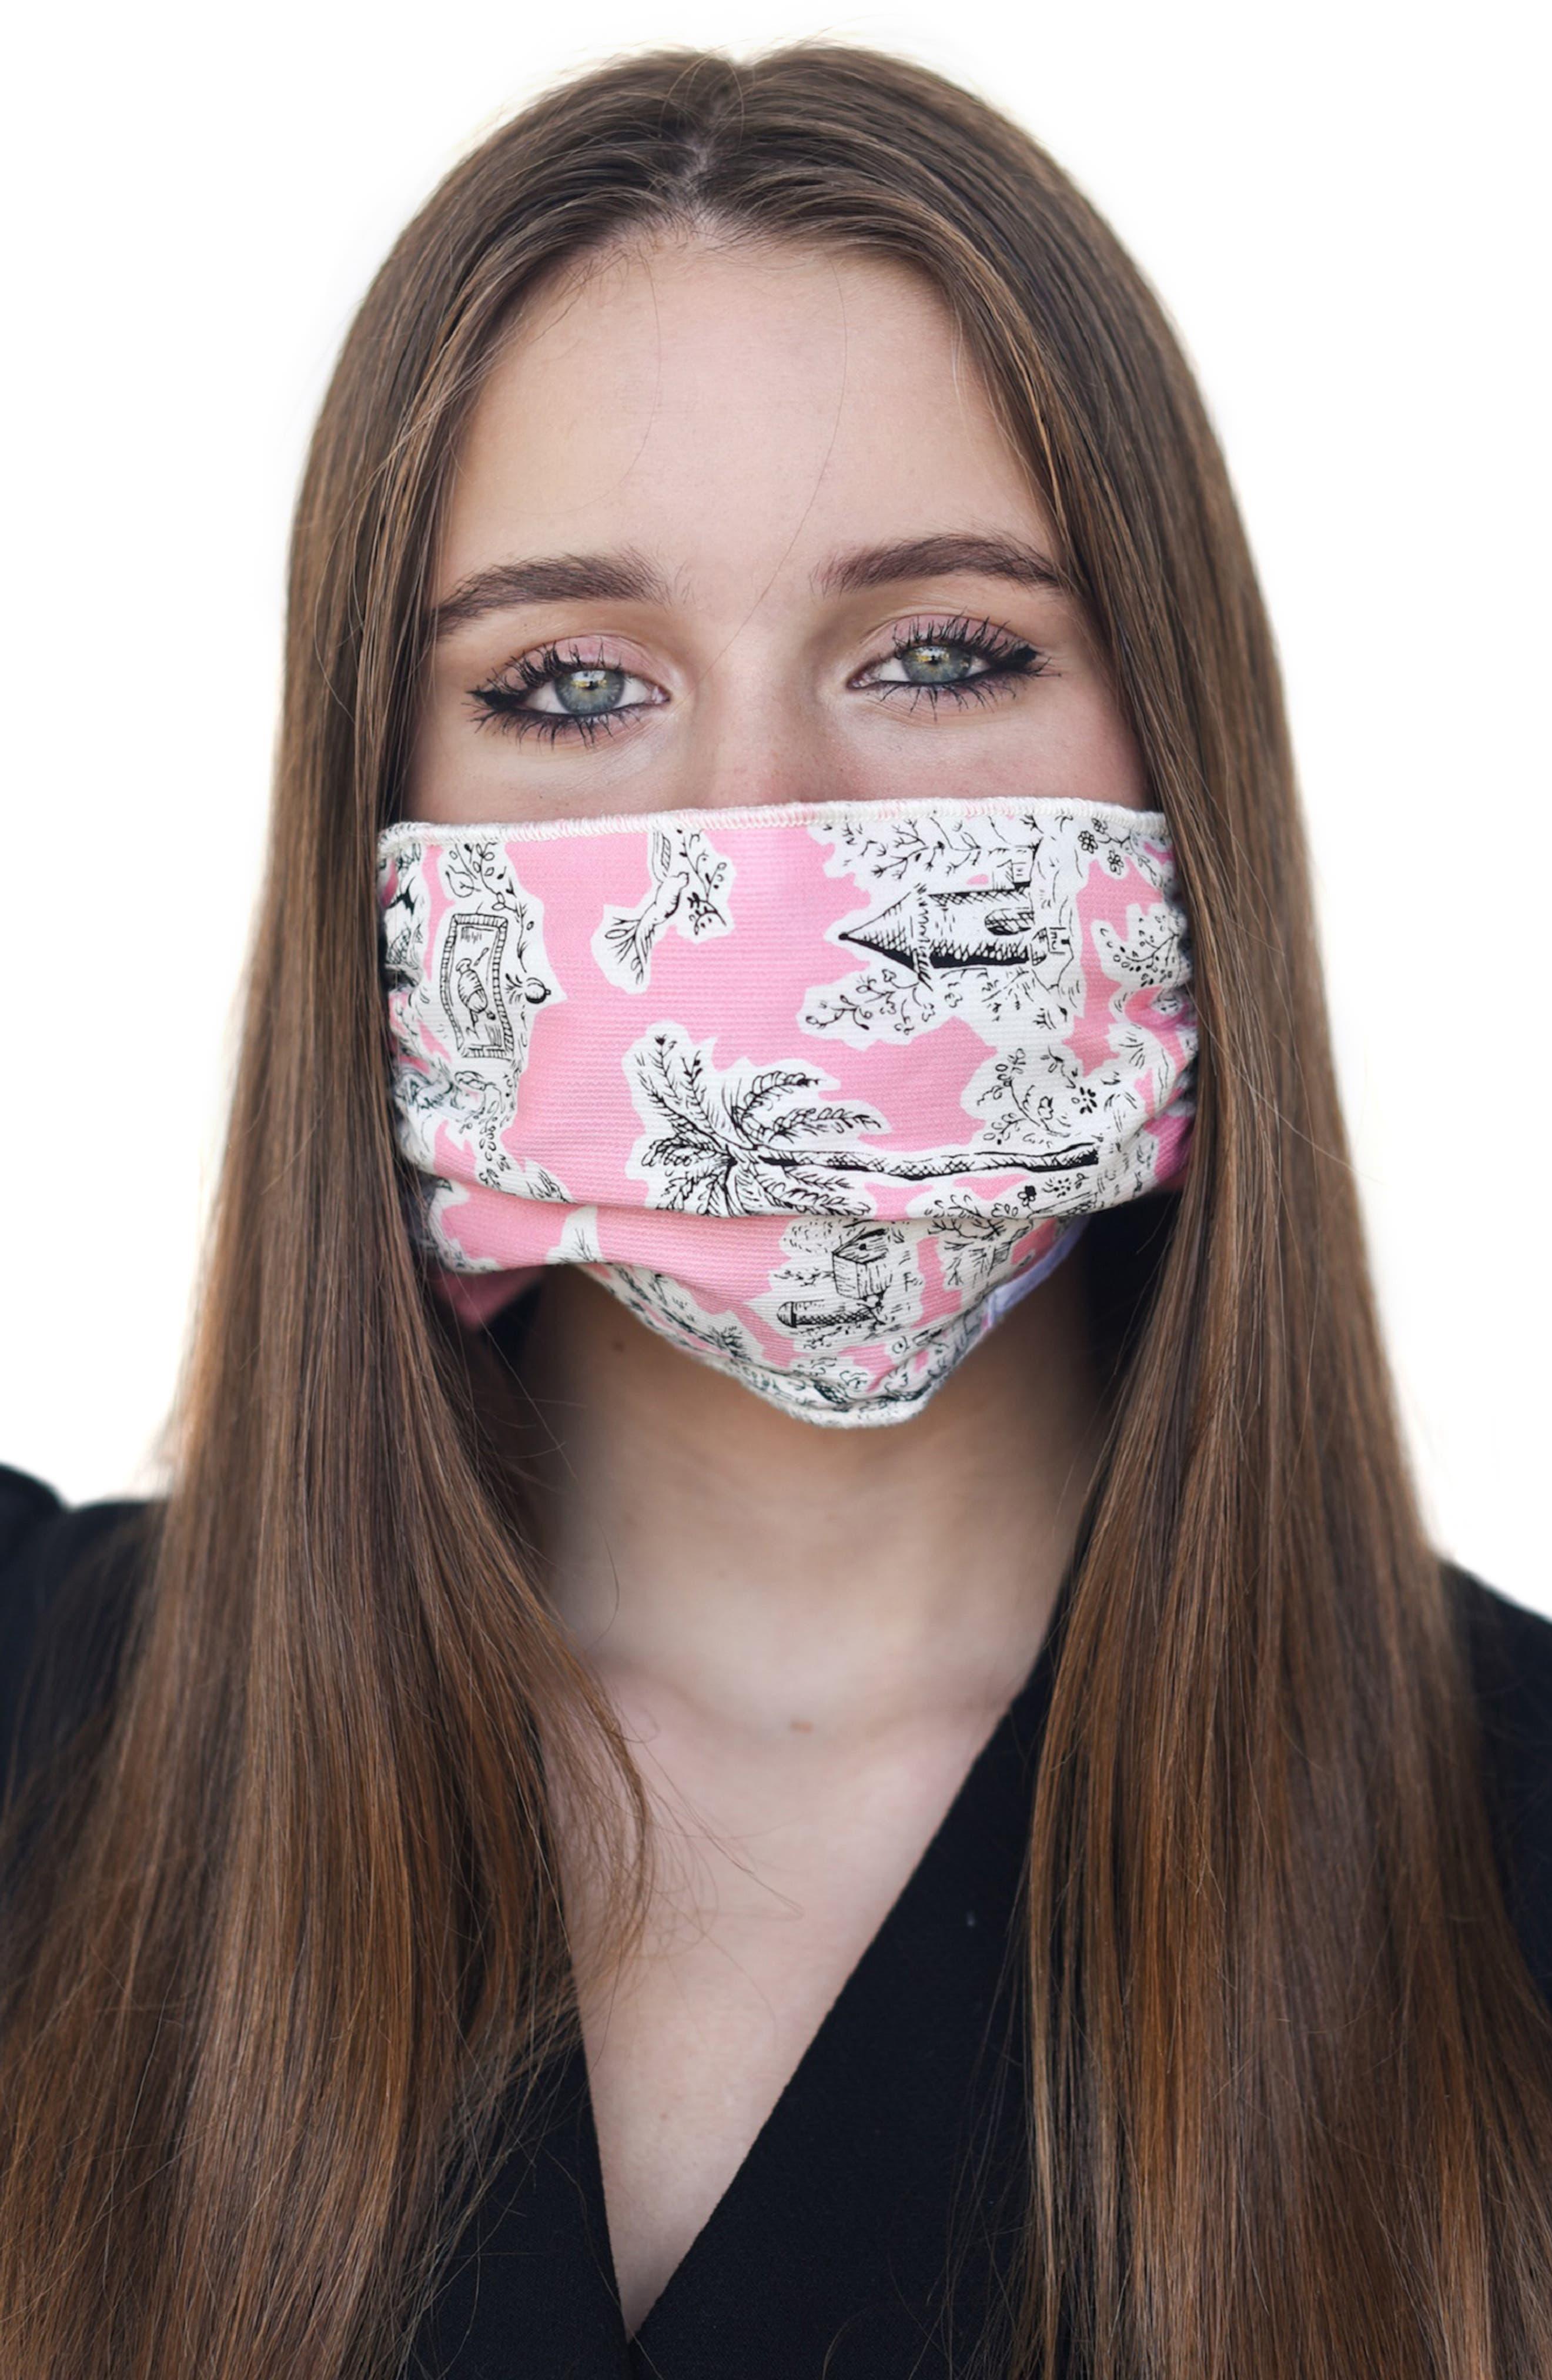 Women's Mali + Lili Adult Four Layer Adult Mask Scarf